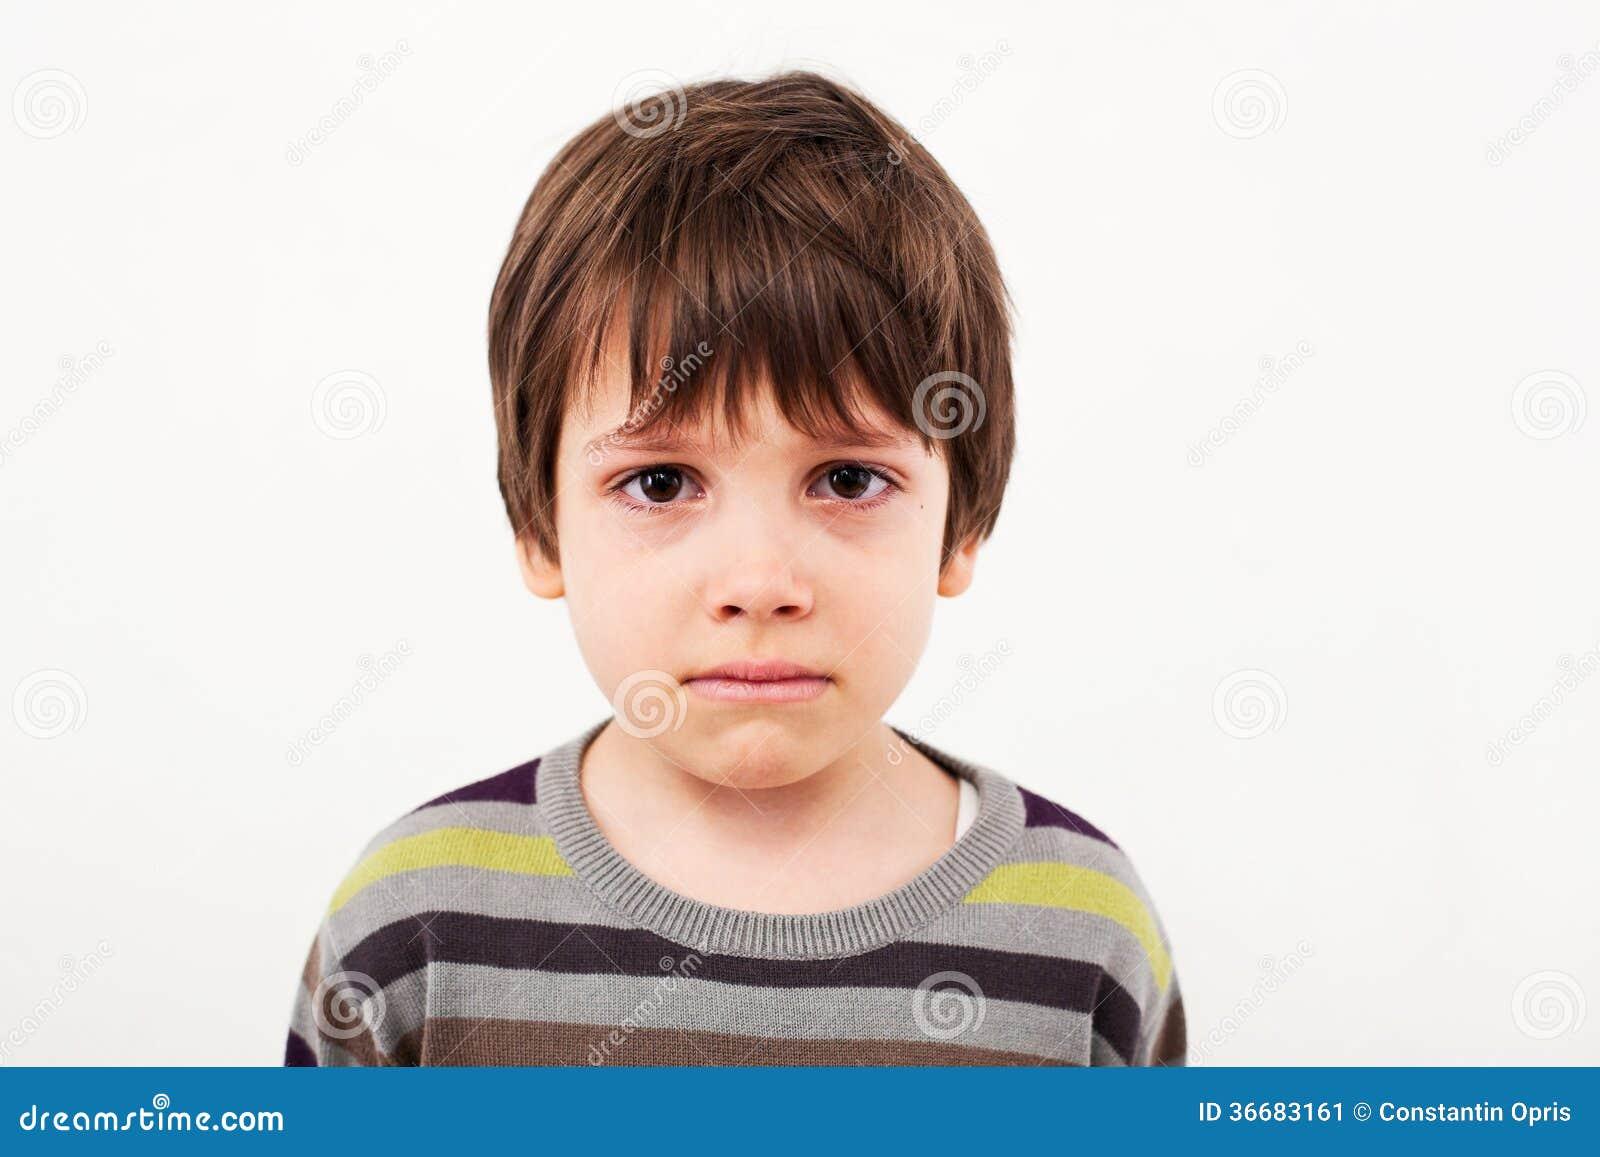 Top Visage Triste D'enfant Image stock - Image: 36683161 JT01